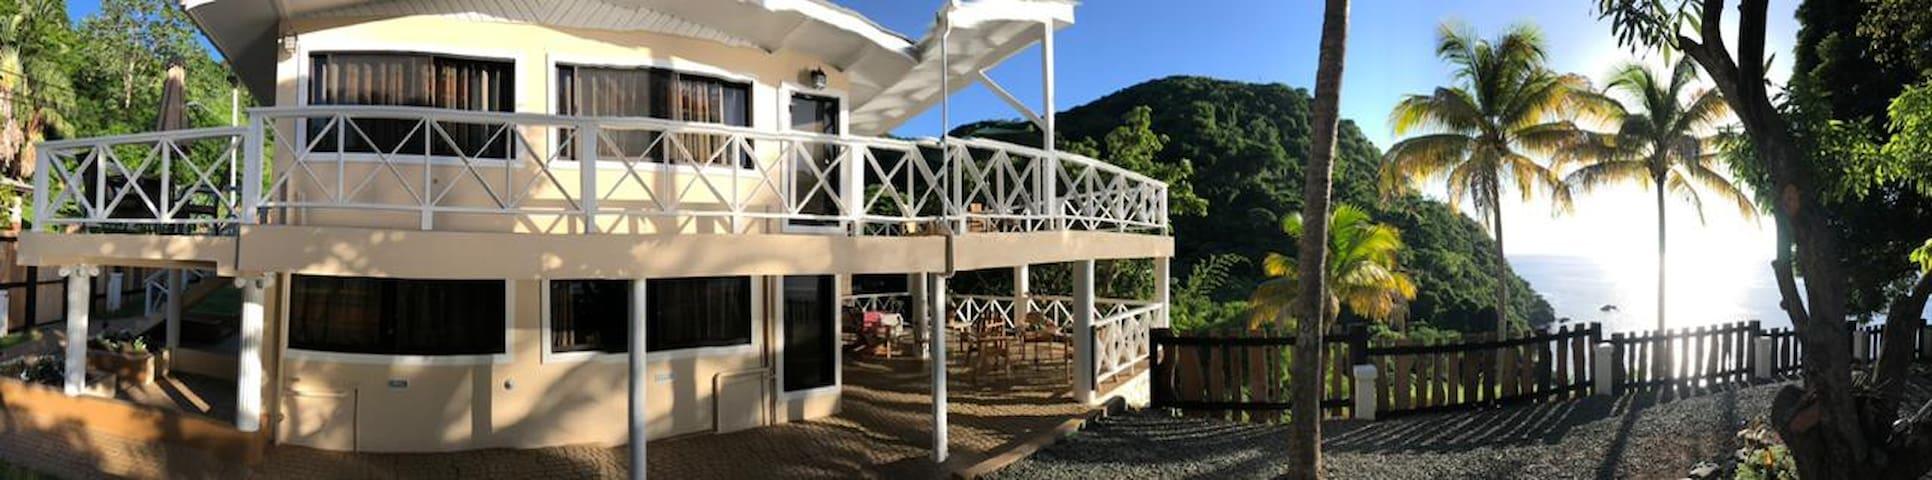 Castara Inn, Tobago, relax in paradise.